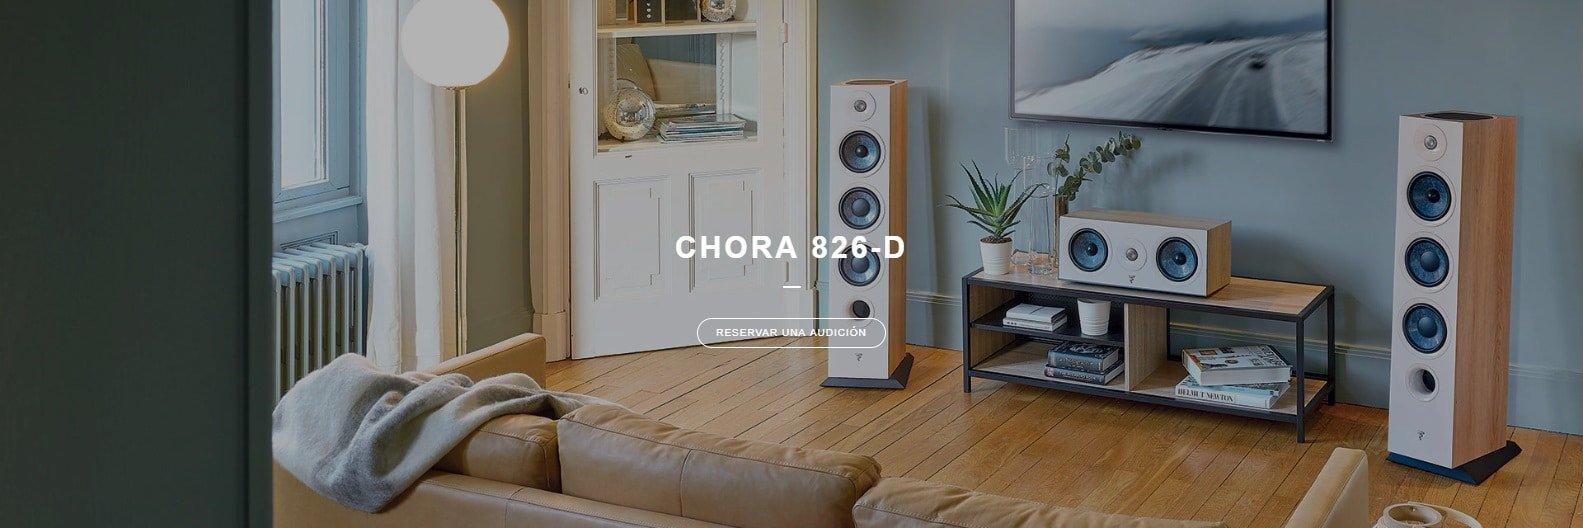 Chora 826-D